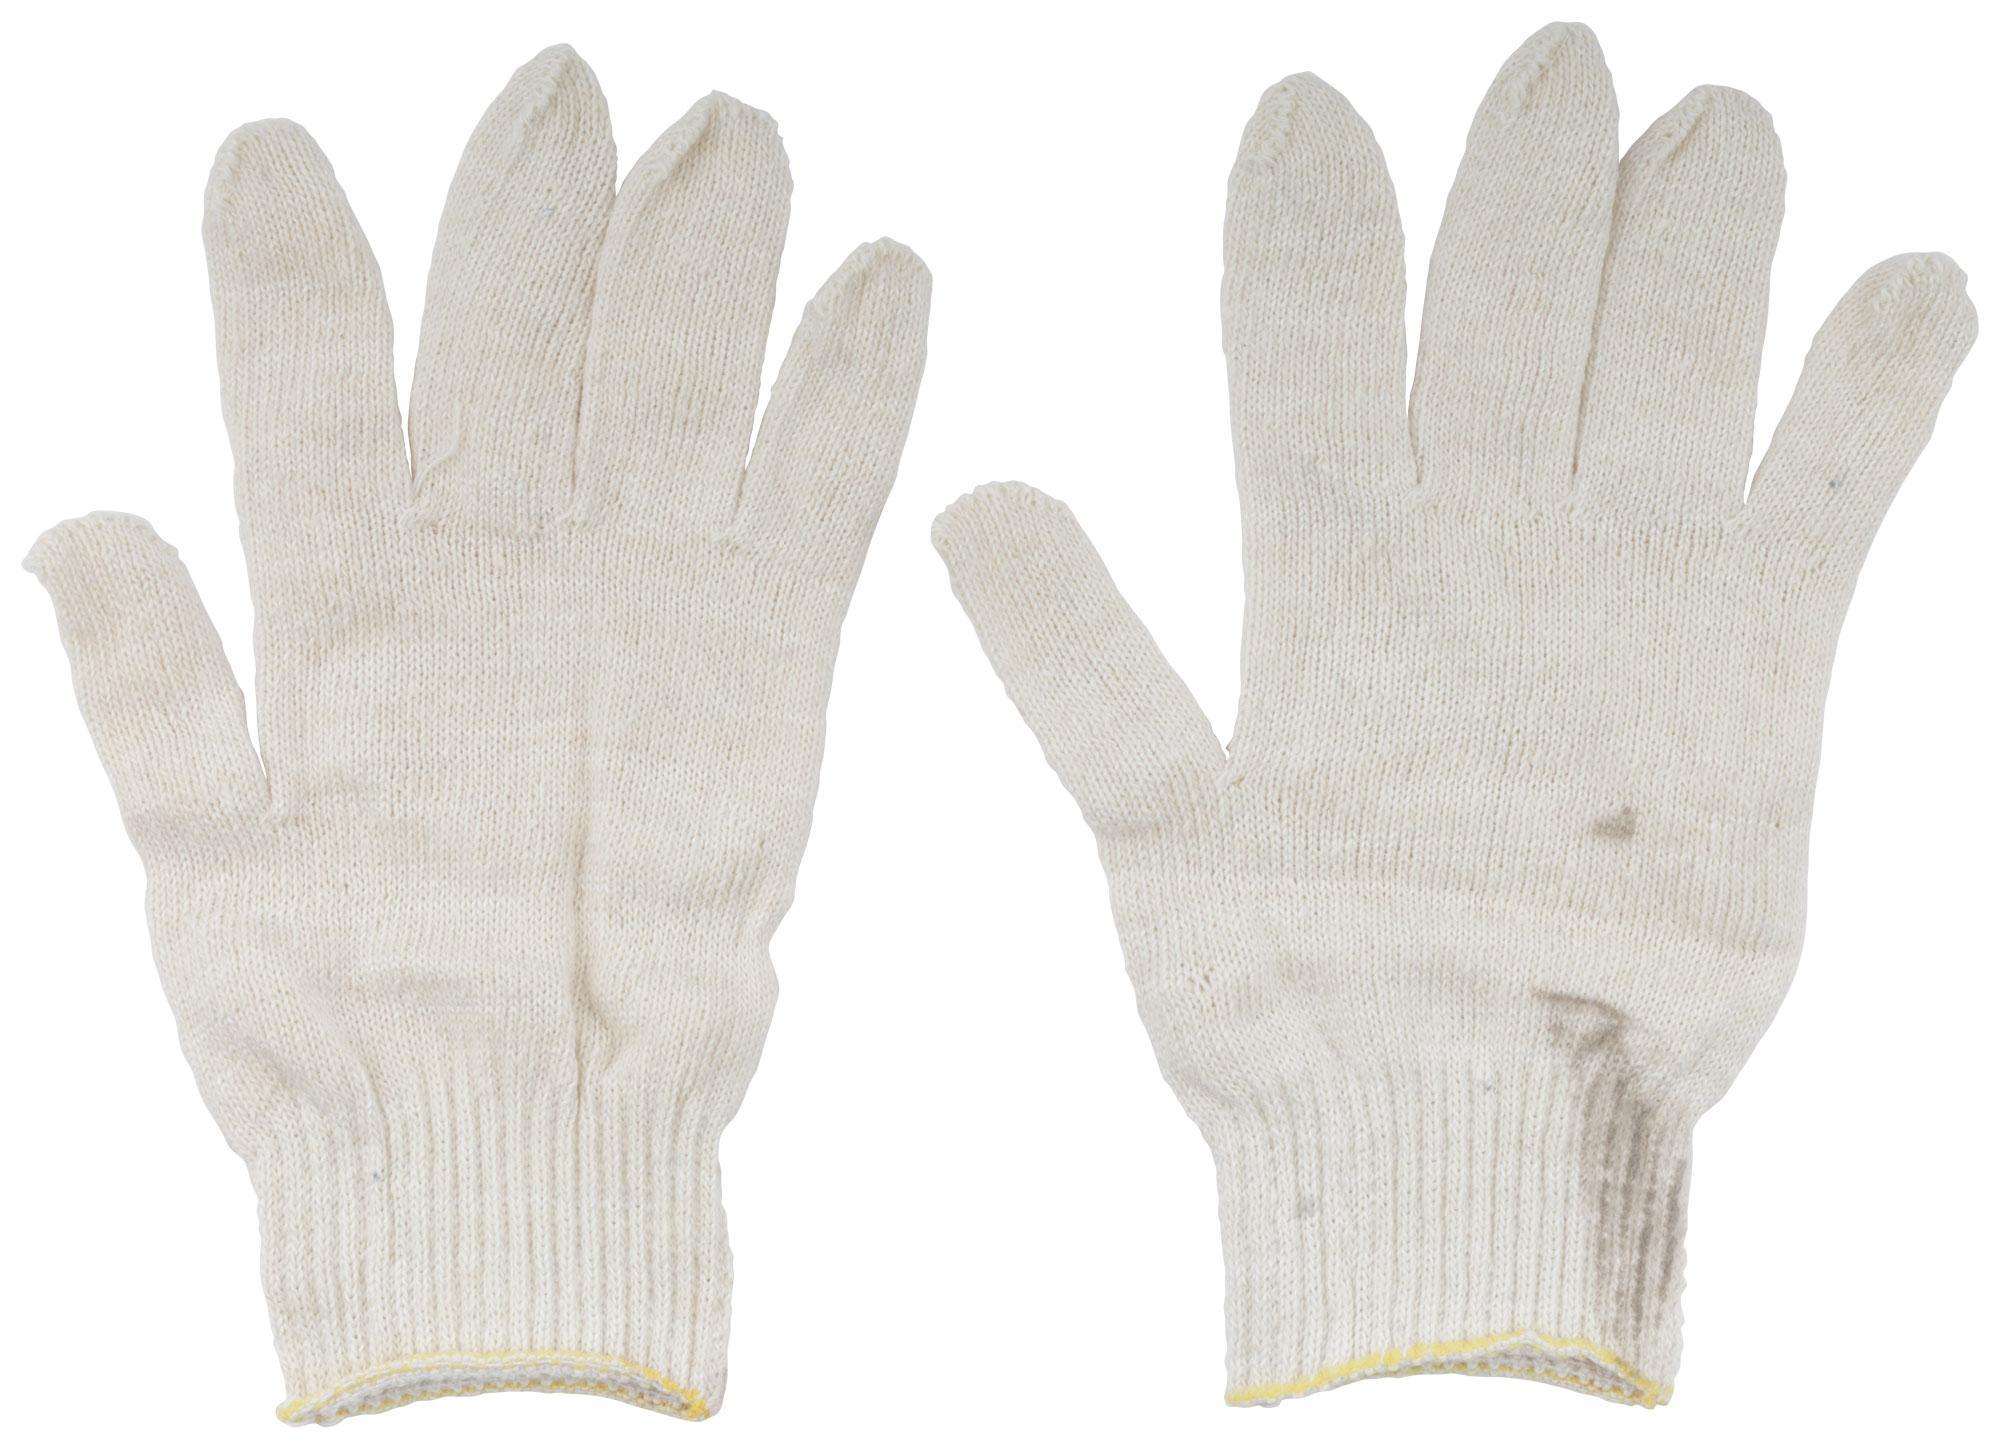 Перчатки ПВХ Fit 12487 размер перчаток